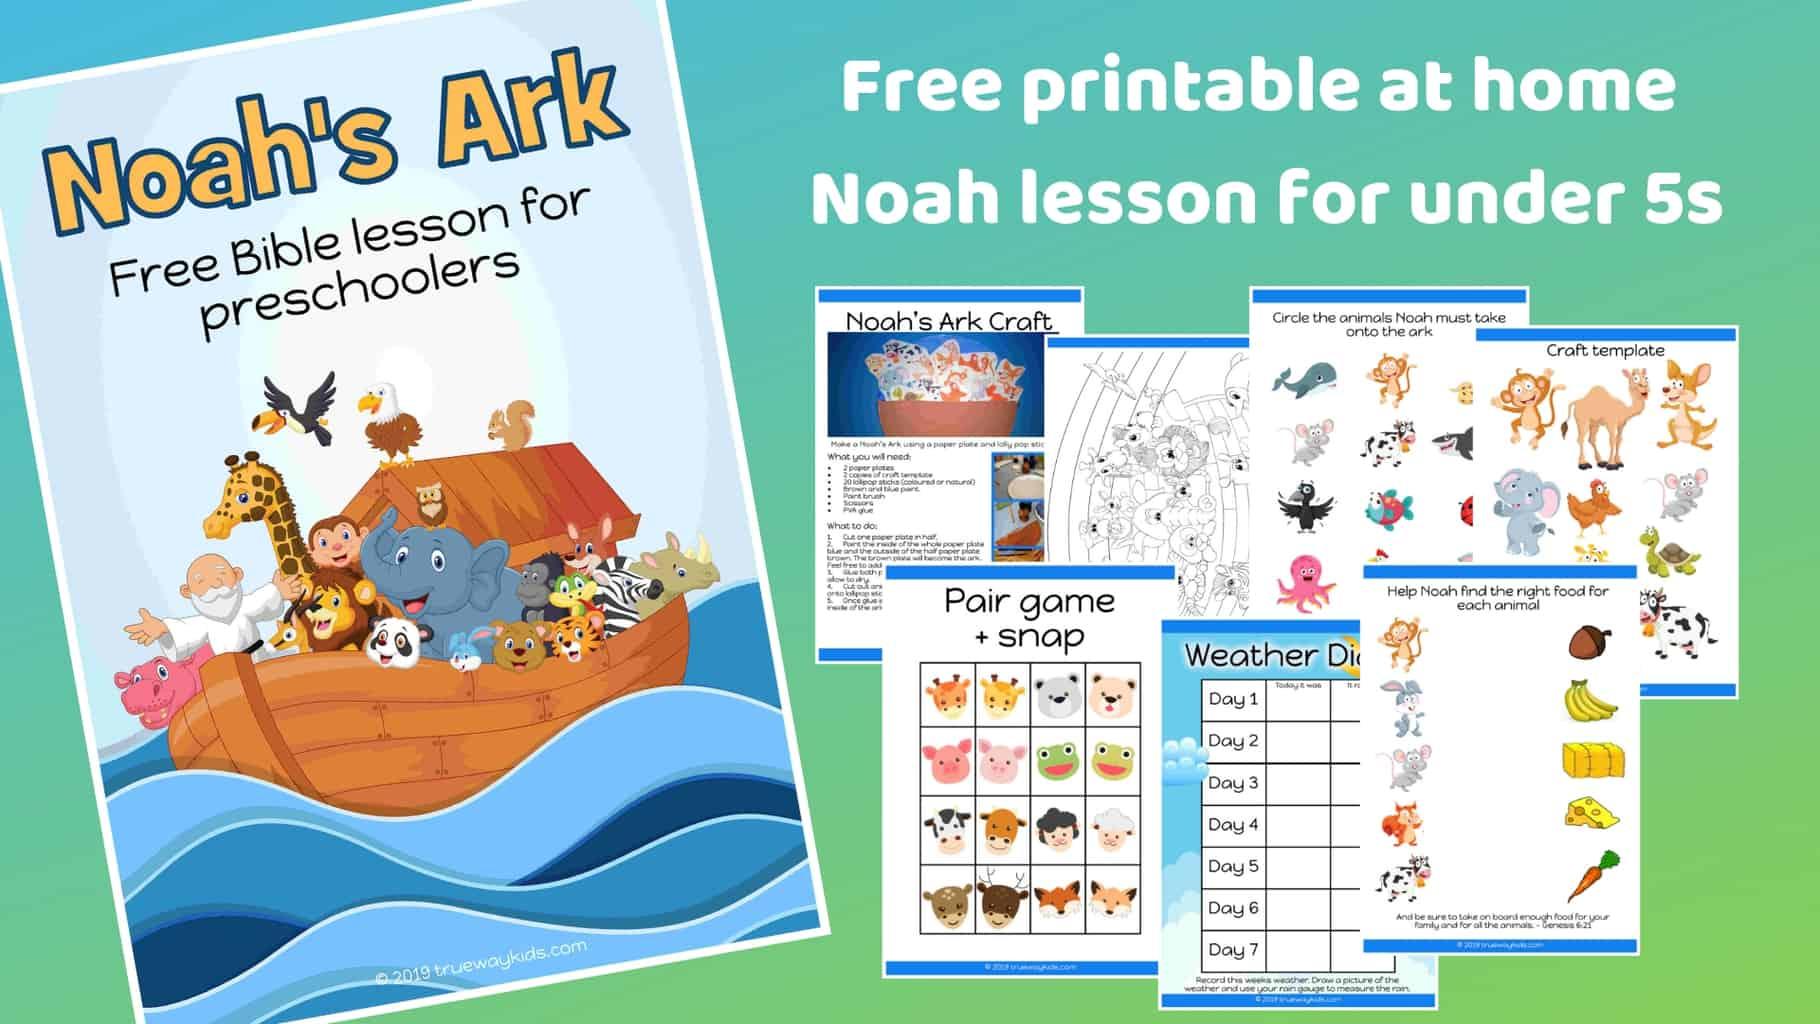 picture regarding Noah's Ark Printable named Noahs Ark - No cost printable Bible lesson for preschoolers